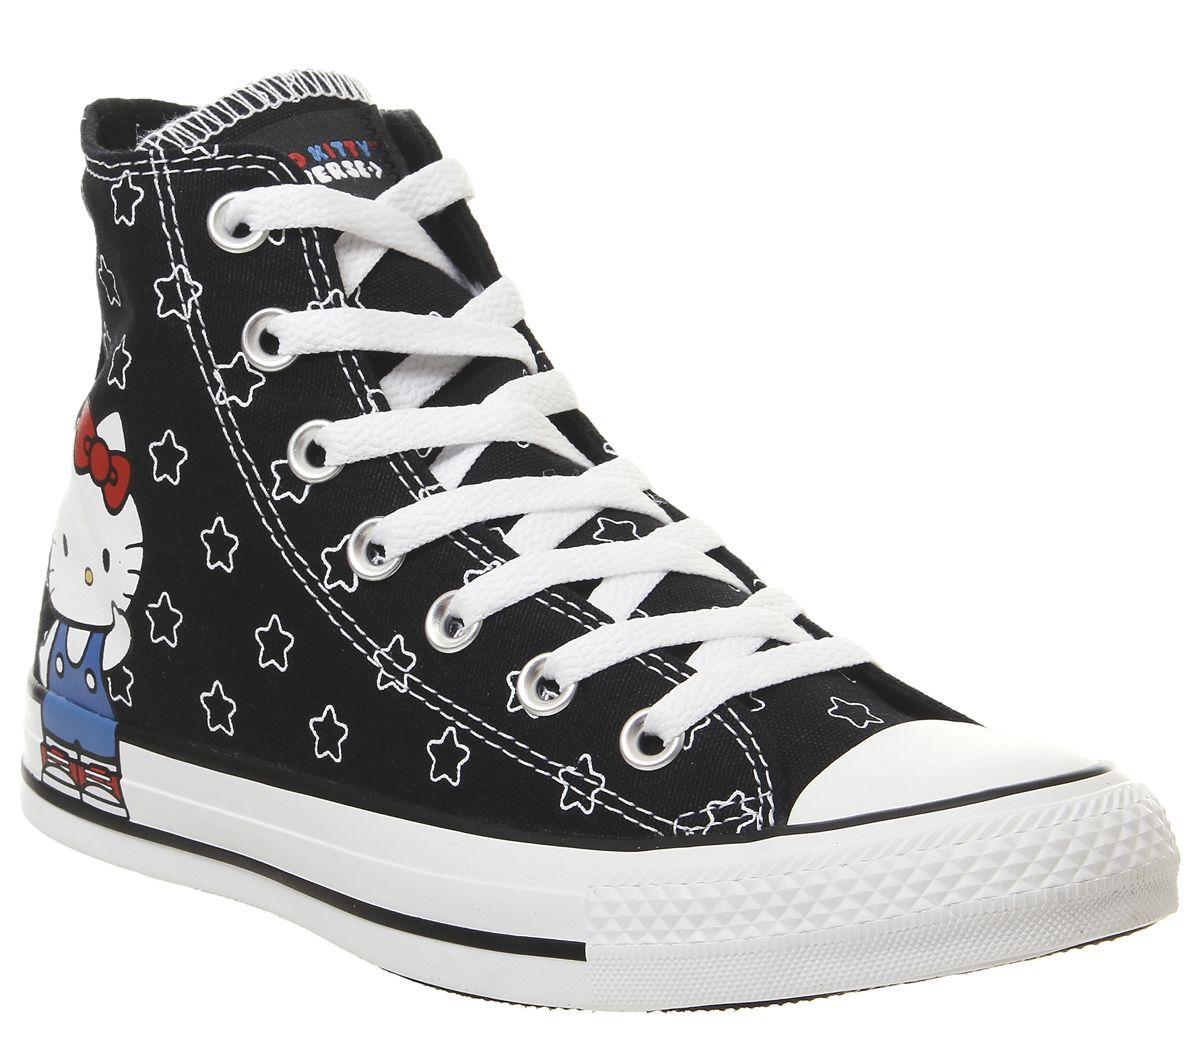 scarpe da donna converse